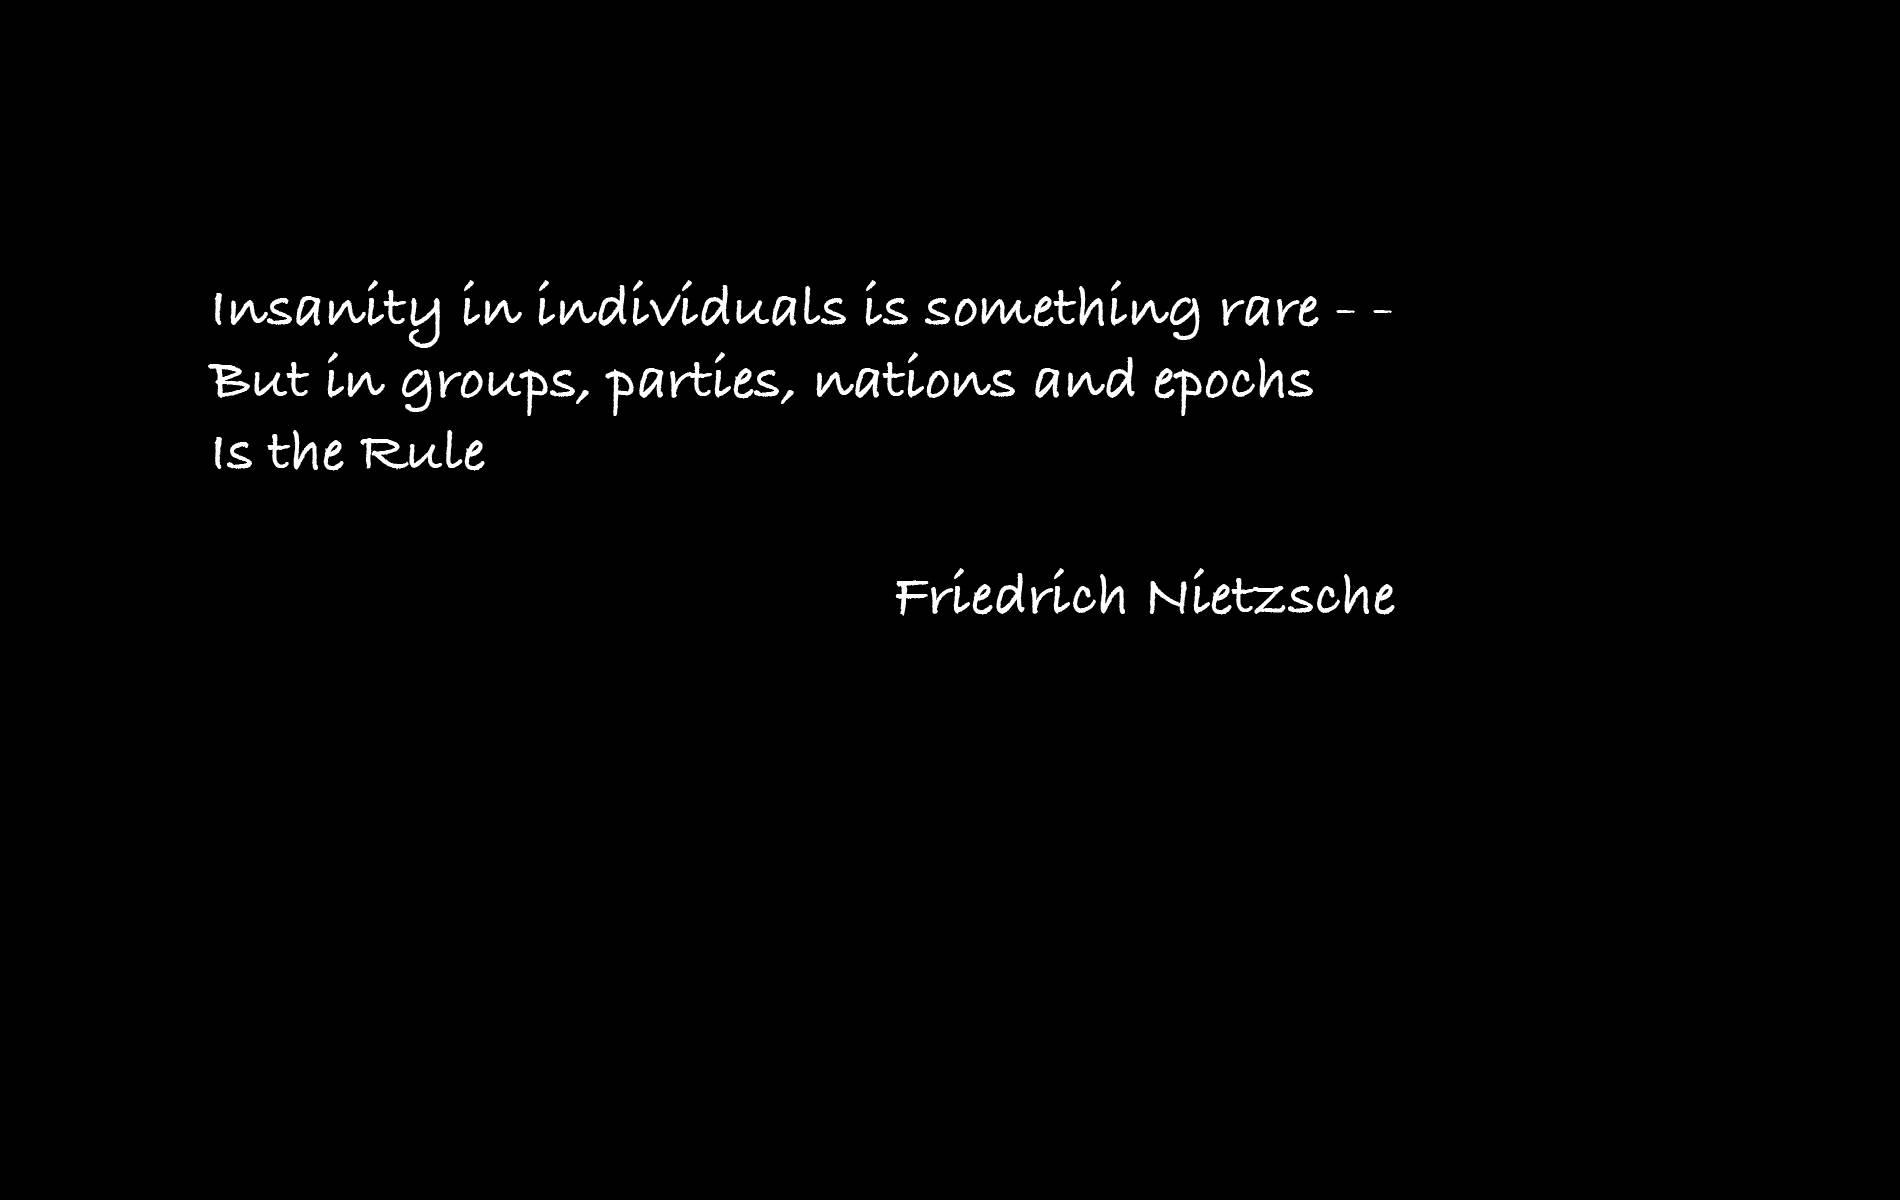 Friedrich Nietzsche Nihilism Quotes. QuotesGram